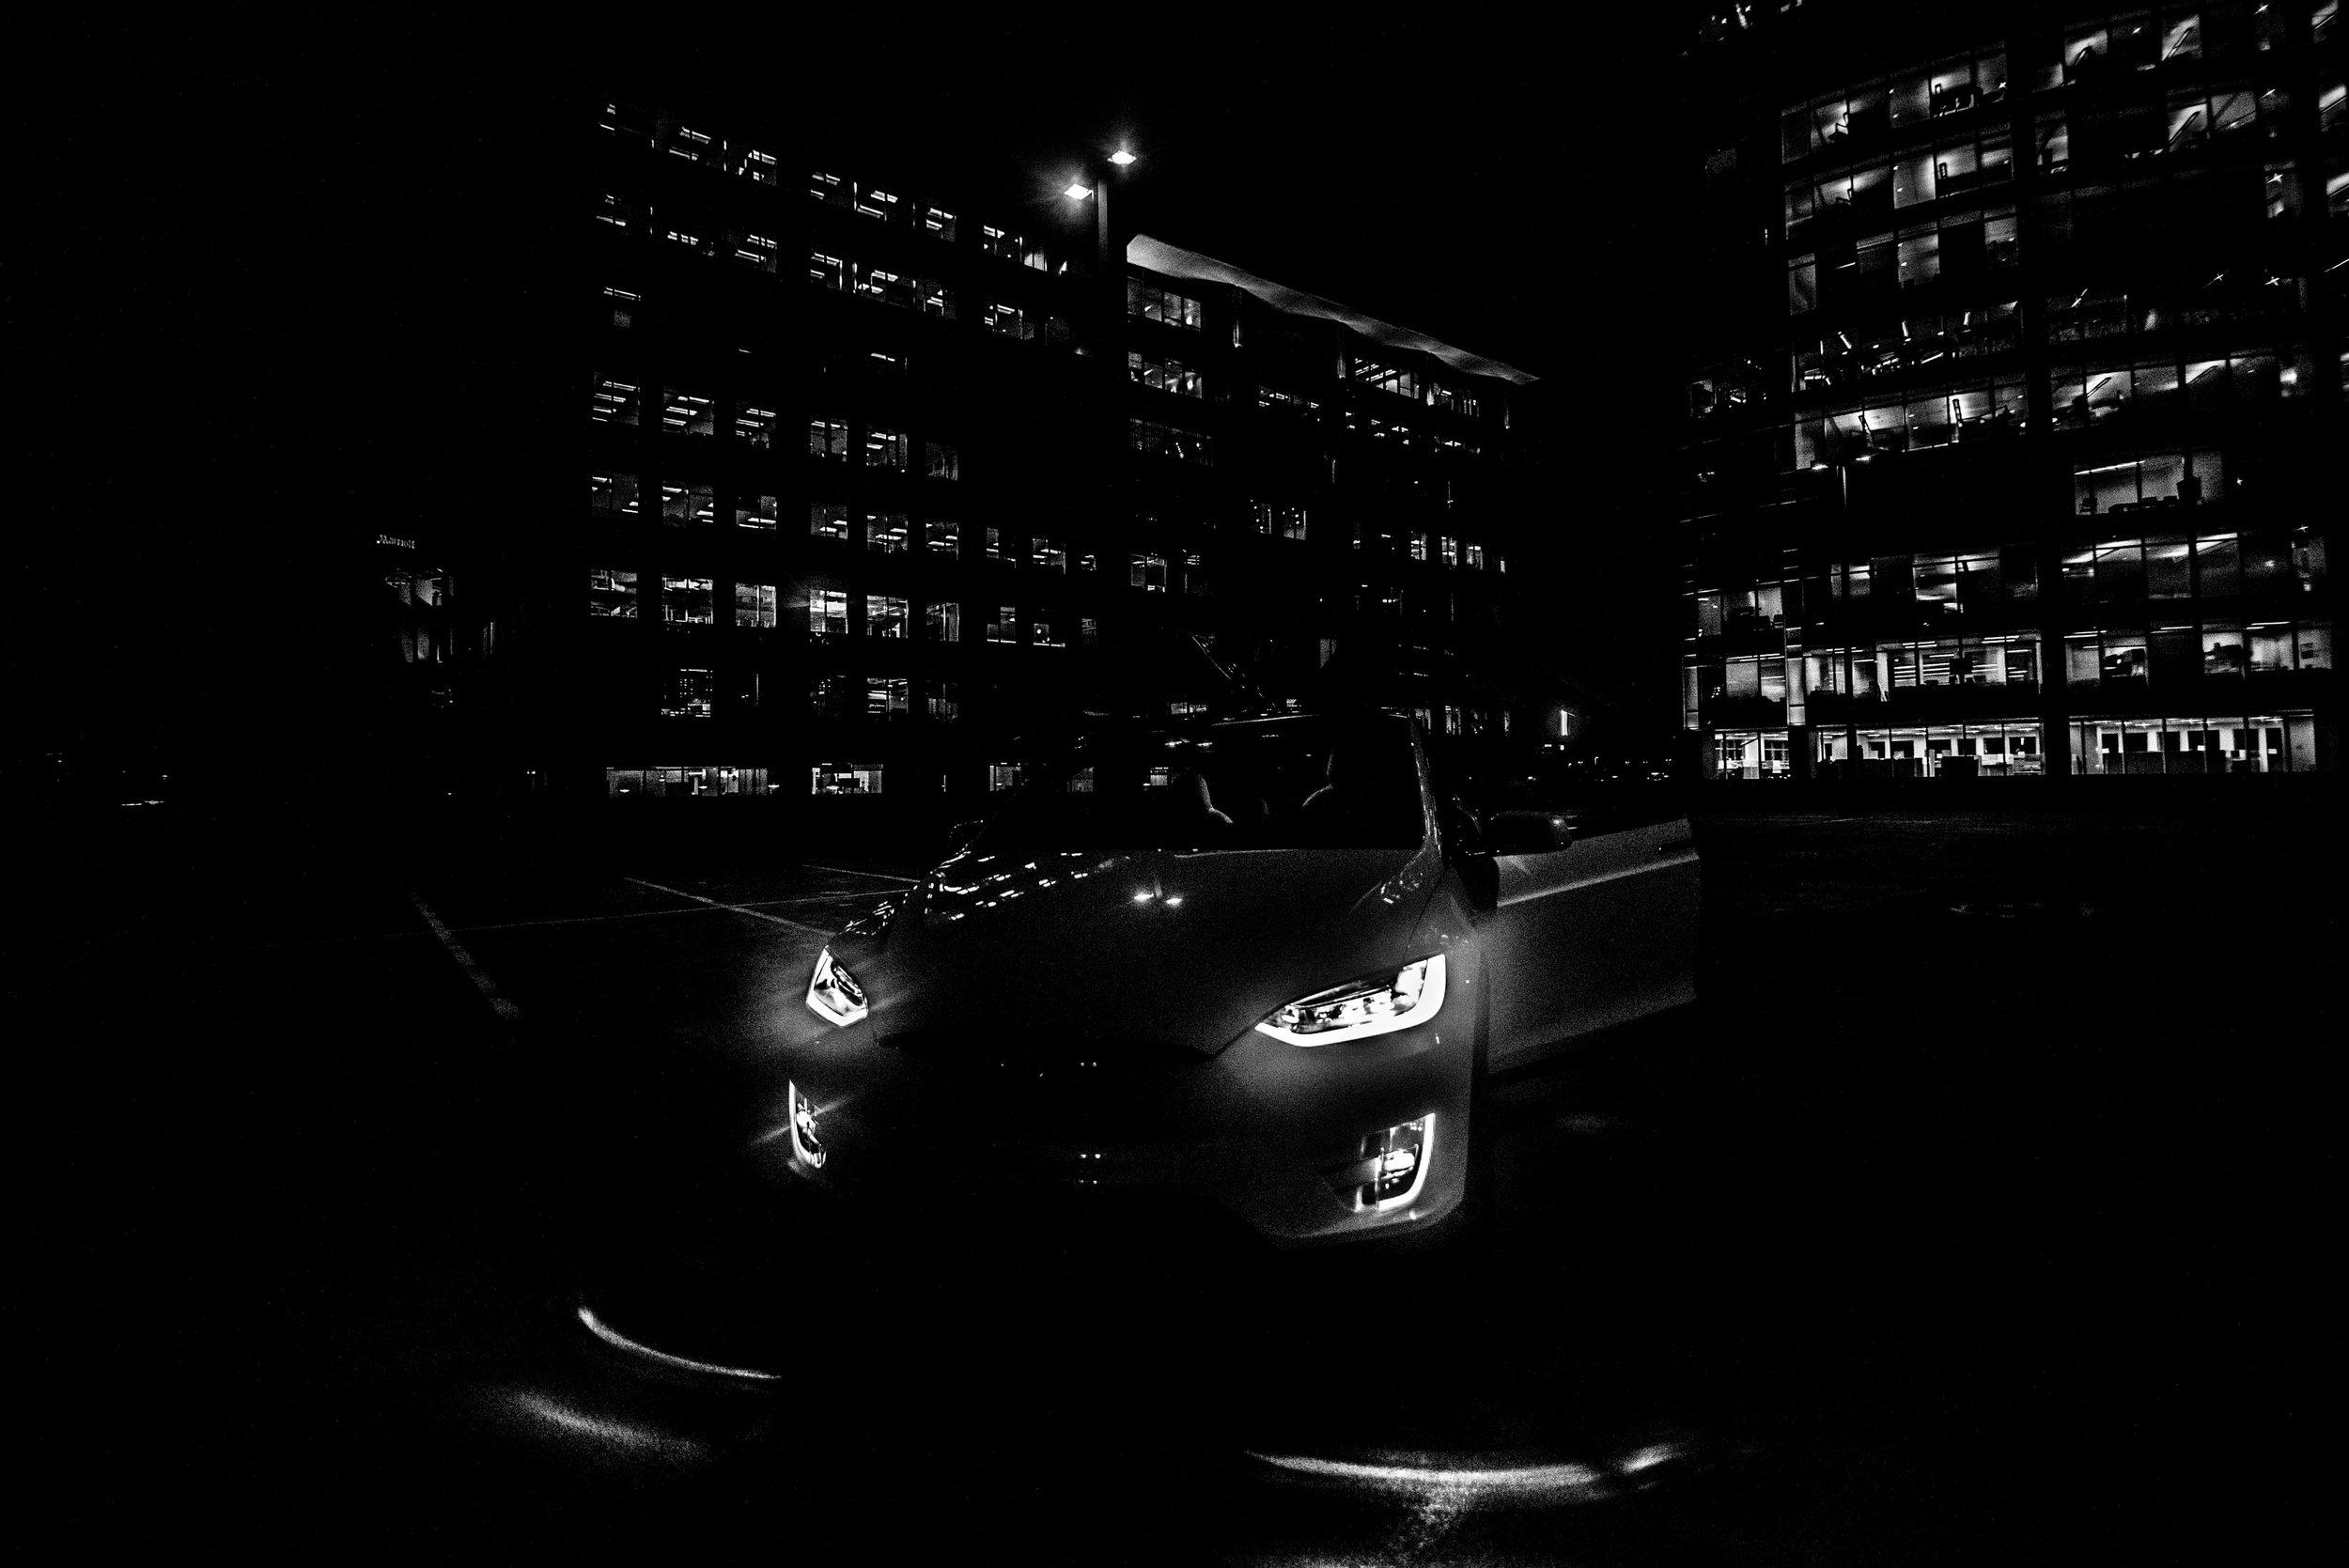 fleet+vehicle+sexy+car+photo+video+speed+tesla+p100d+vadym+guliuk+photography-20.jpg